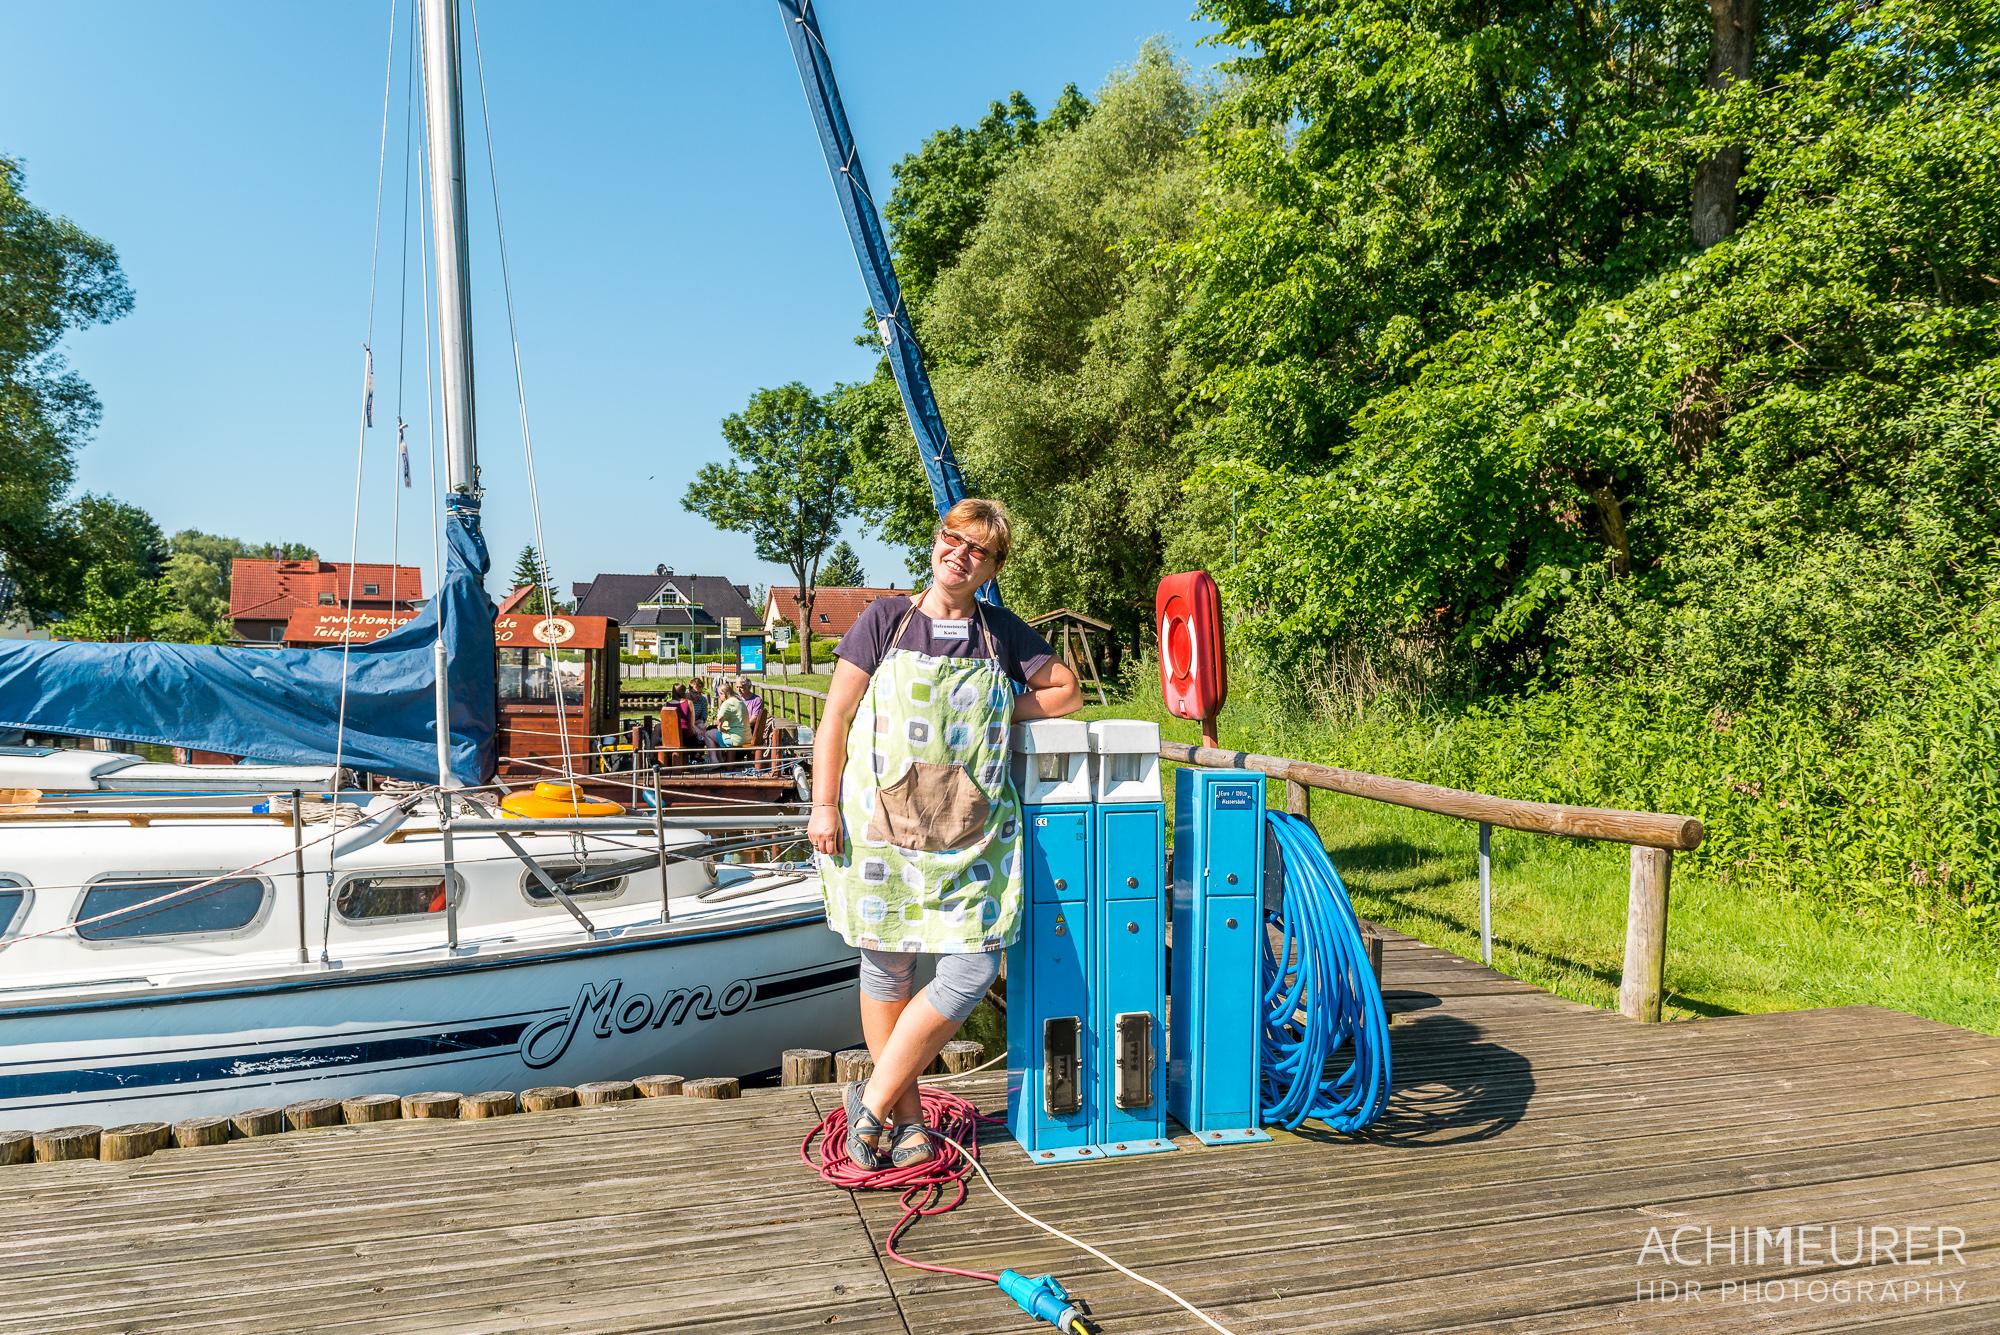 Hausboot-Kuhnle-Mueritz-Mecklenburg-Vorpommern-See_3089